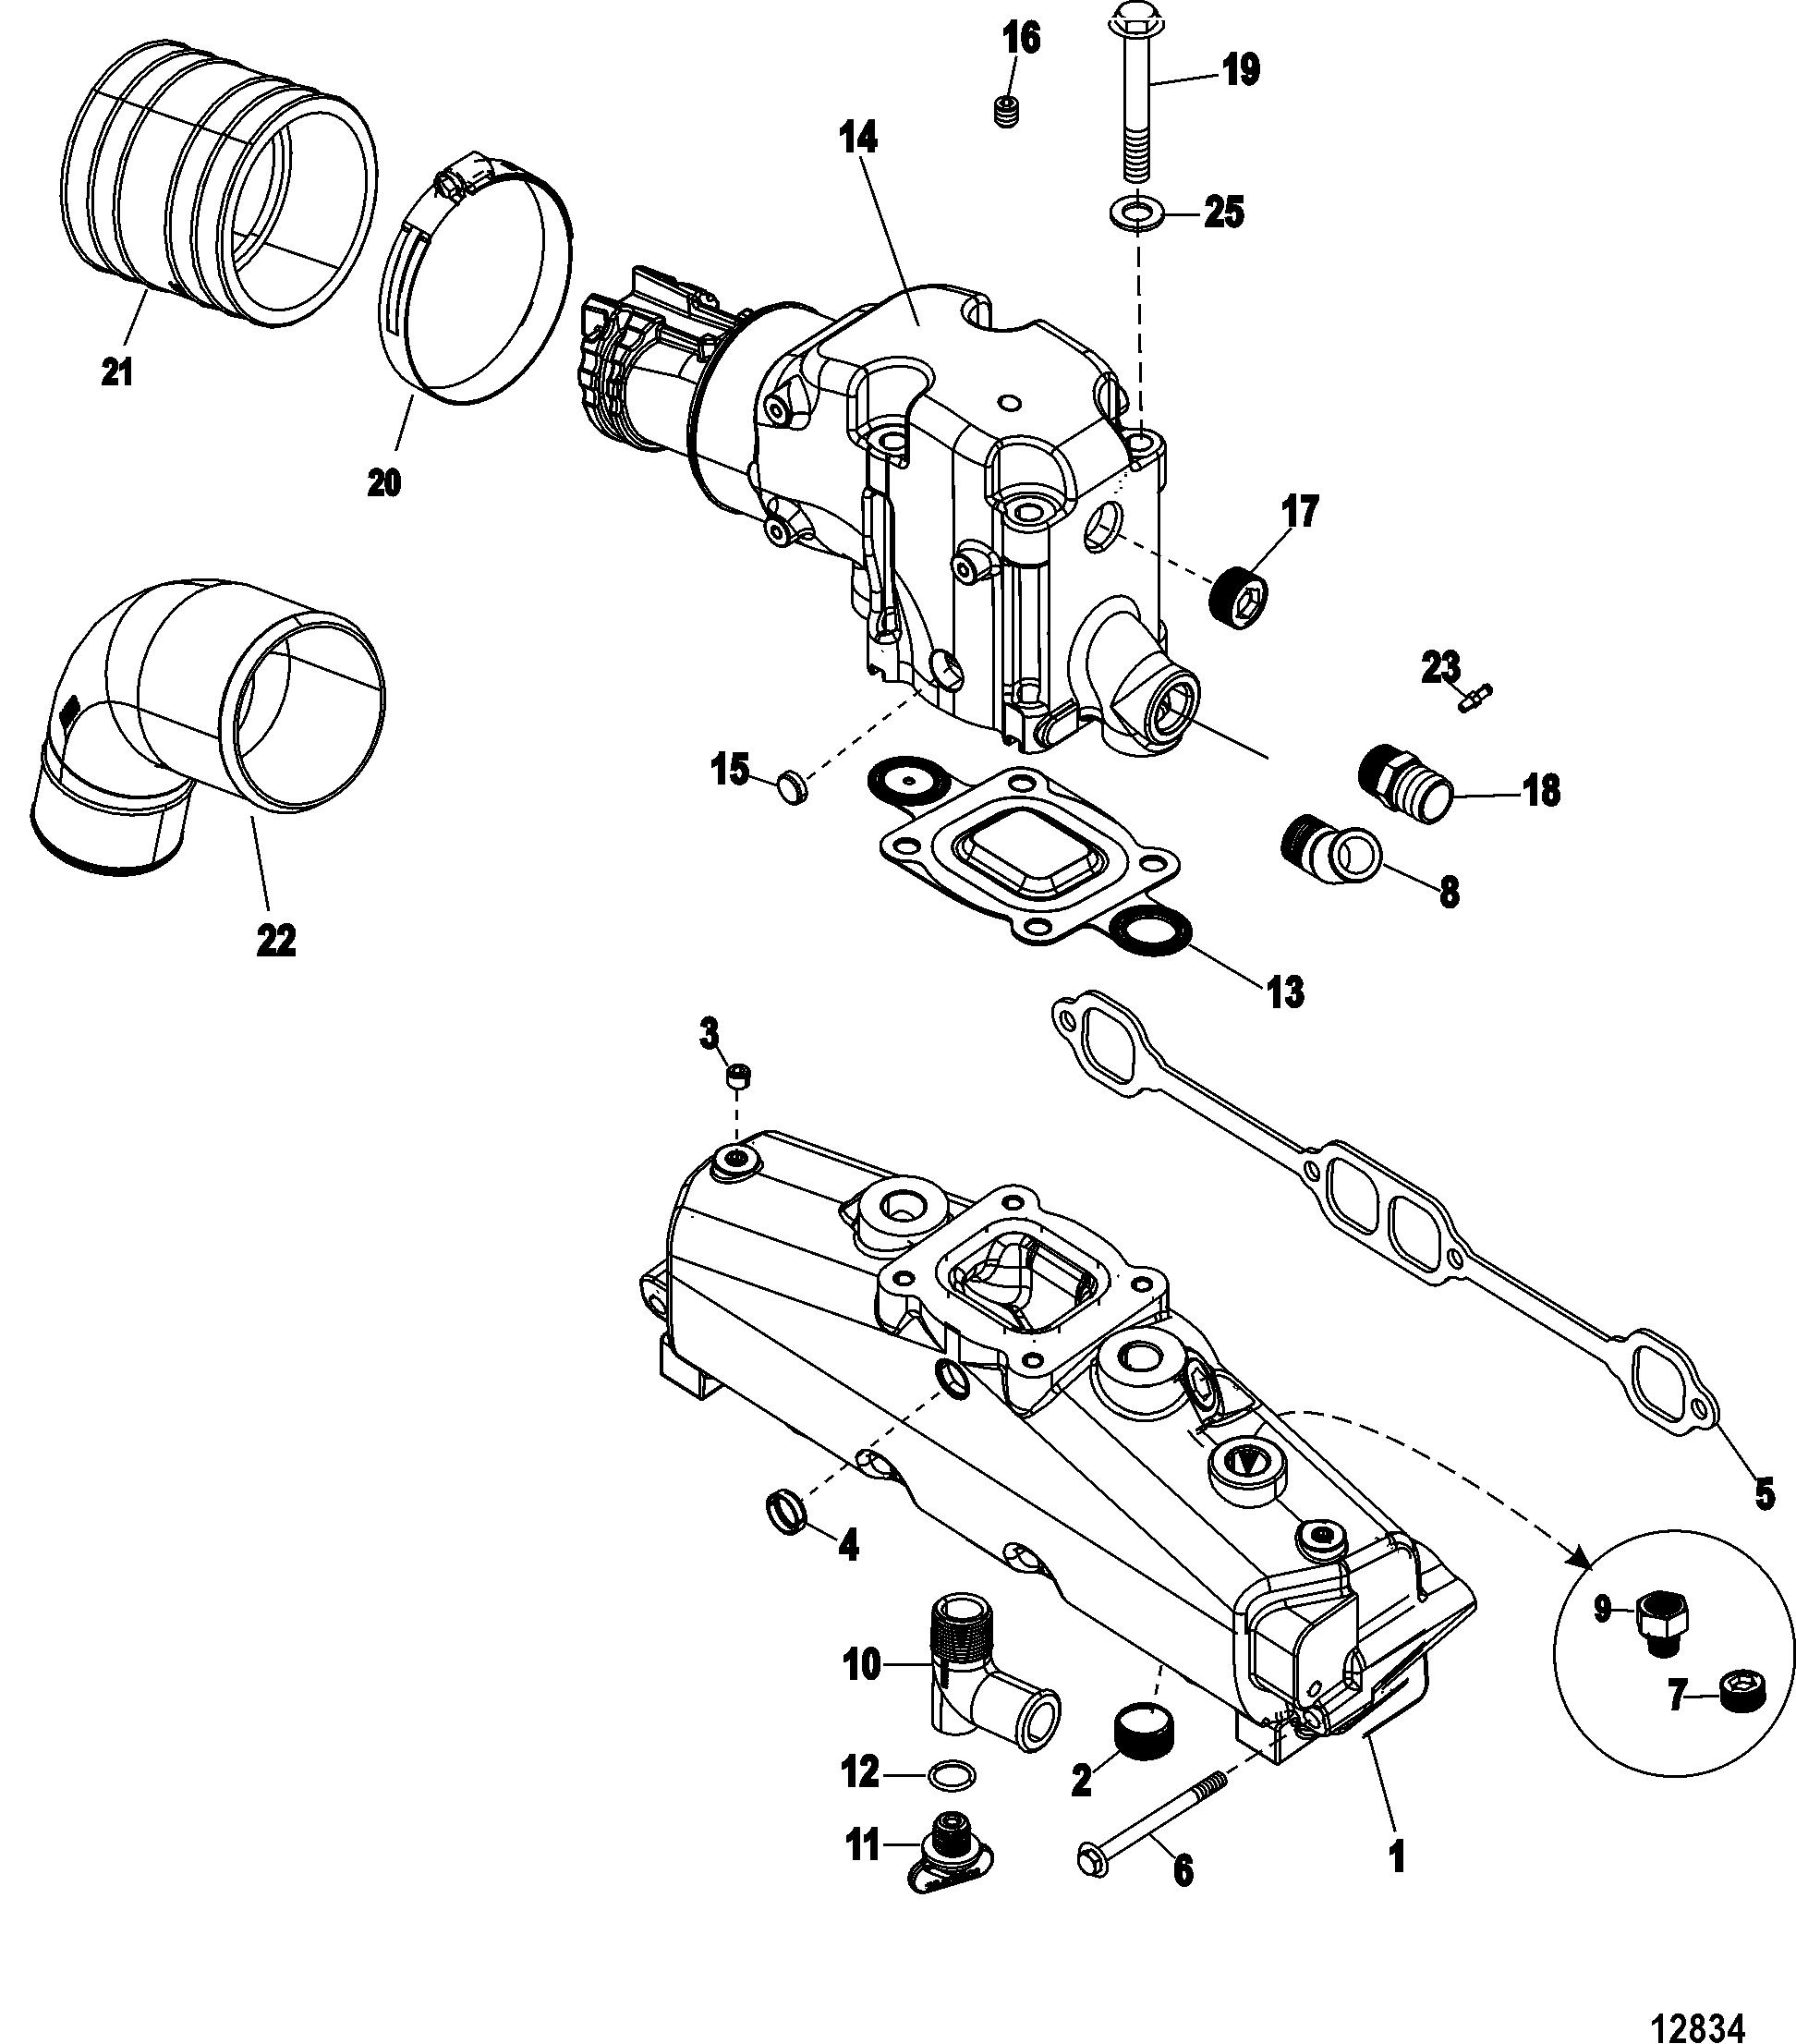 mercruiser 5 0 alternator wiring diagram wds bmw online mercury 7l carb ski 0w694844 and up